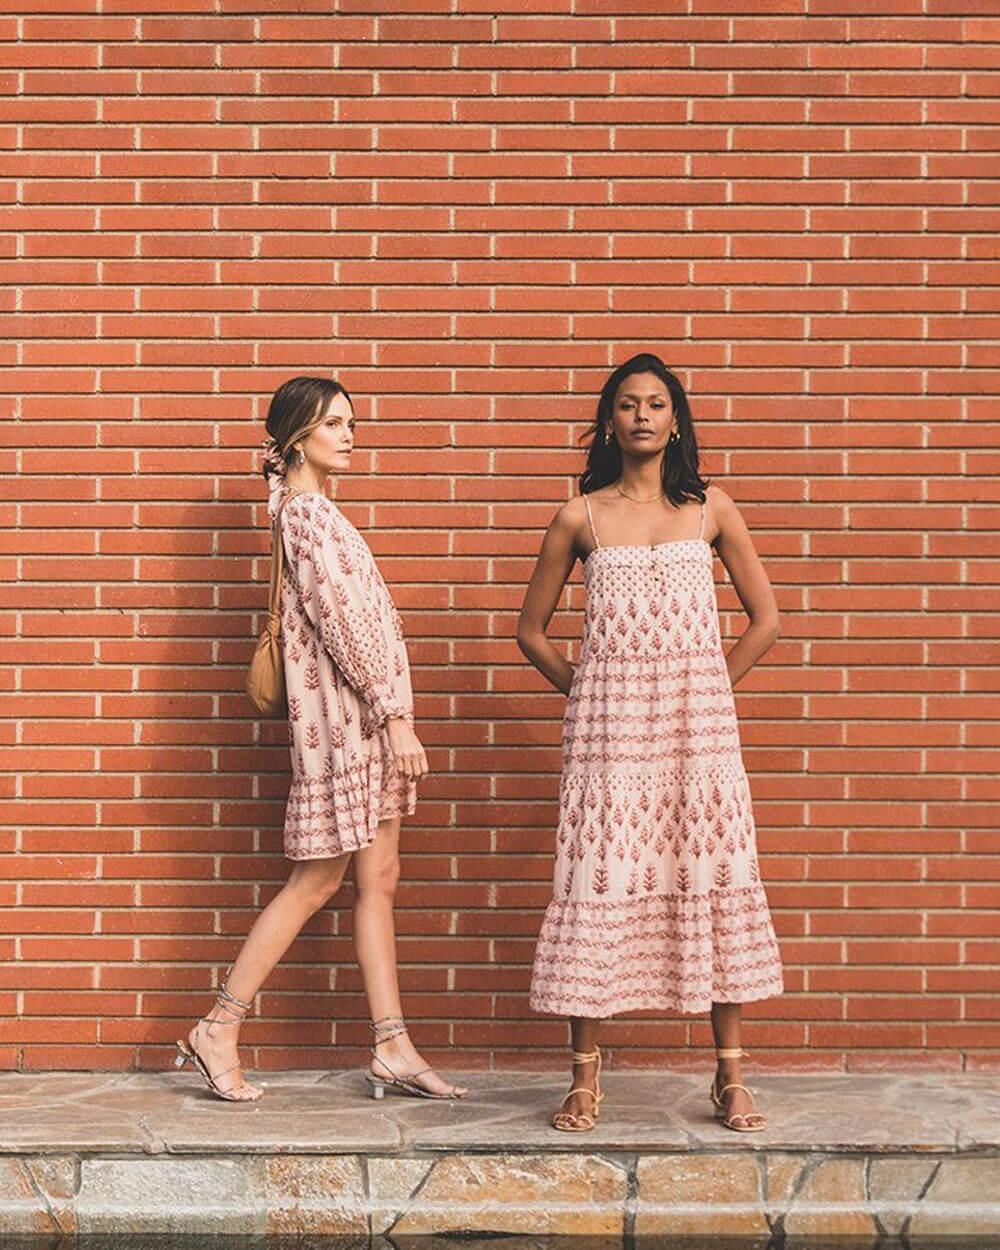 Cleobella boho fashion stores like Anthropologie